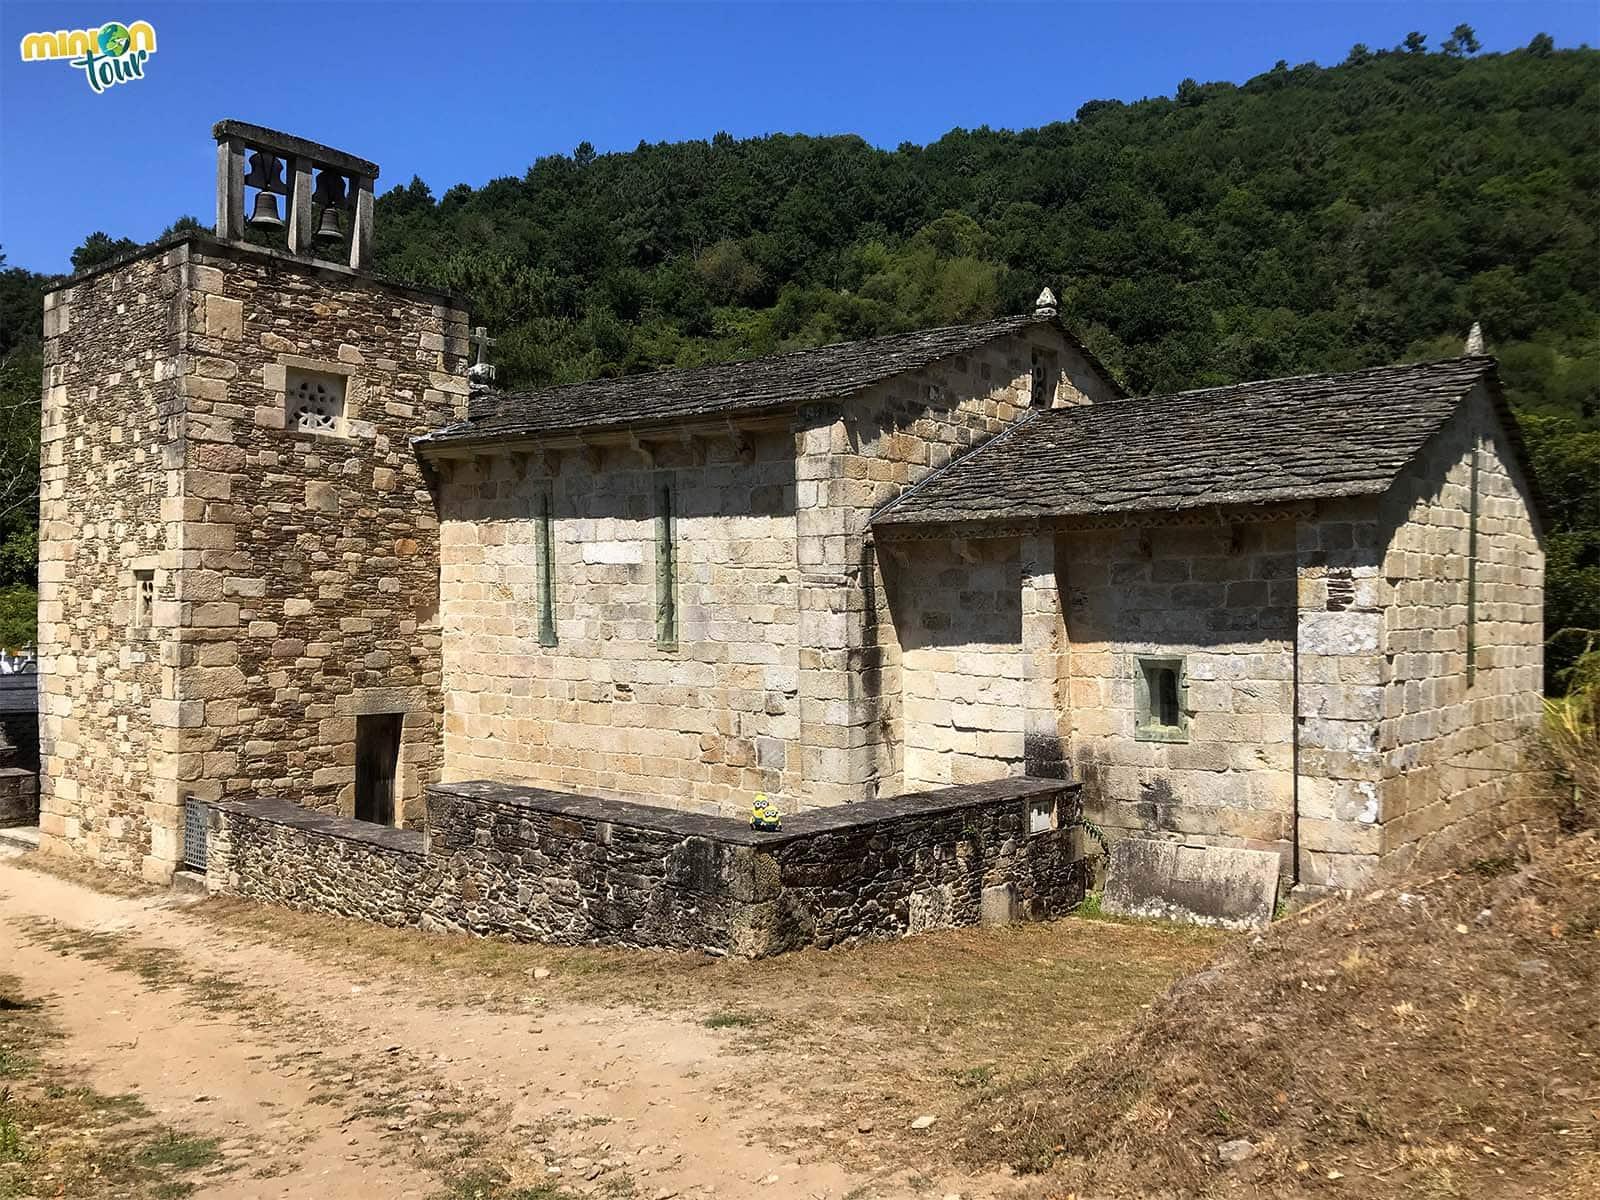 Ruta del Románico de la Ribeira Sacra